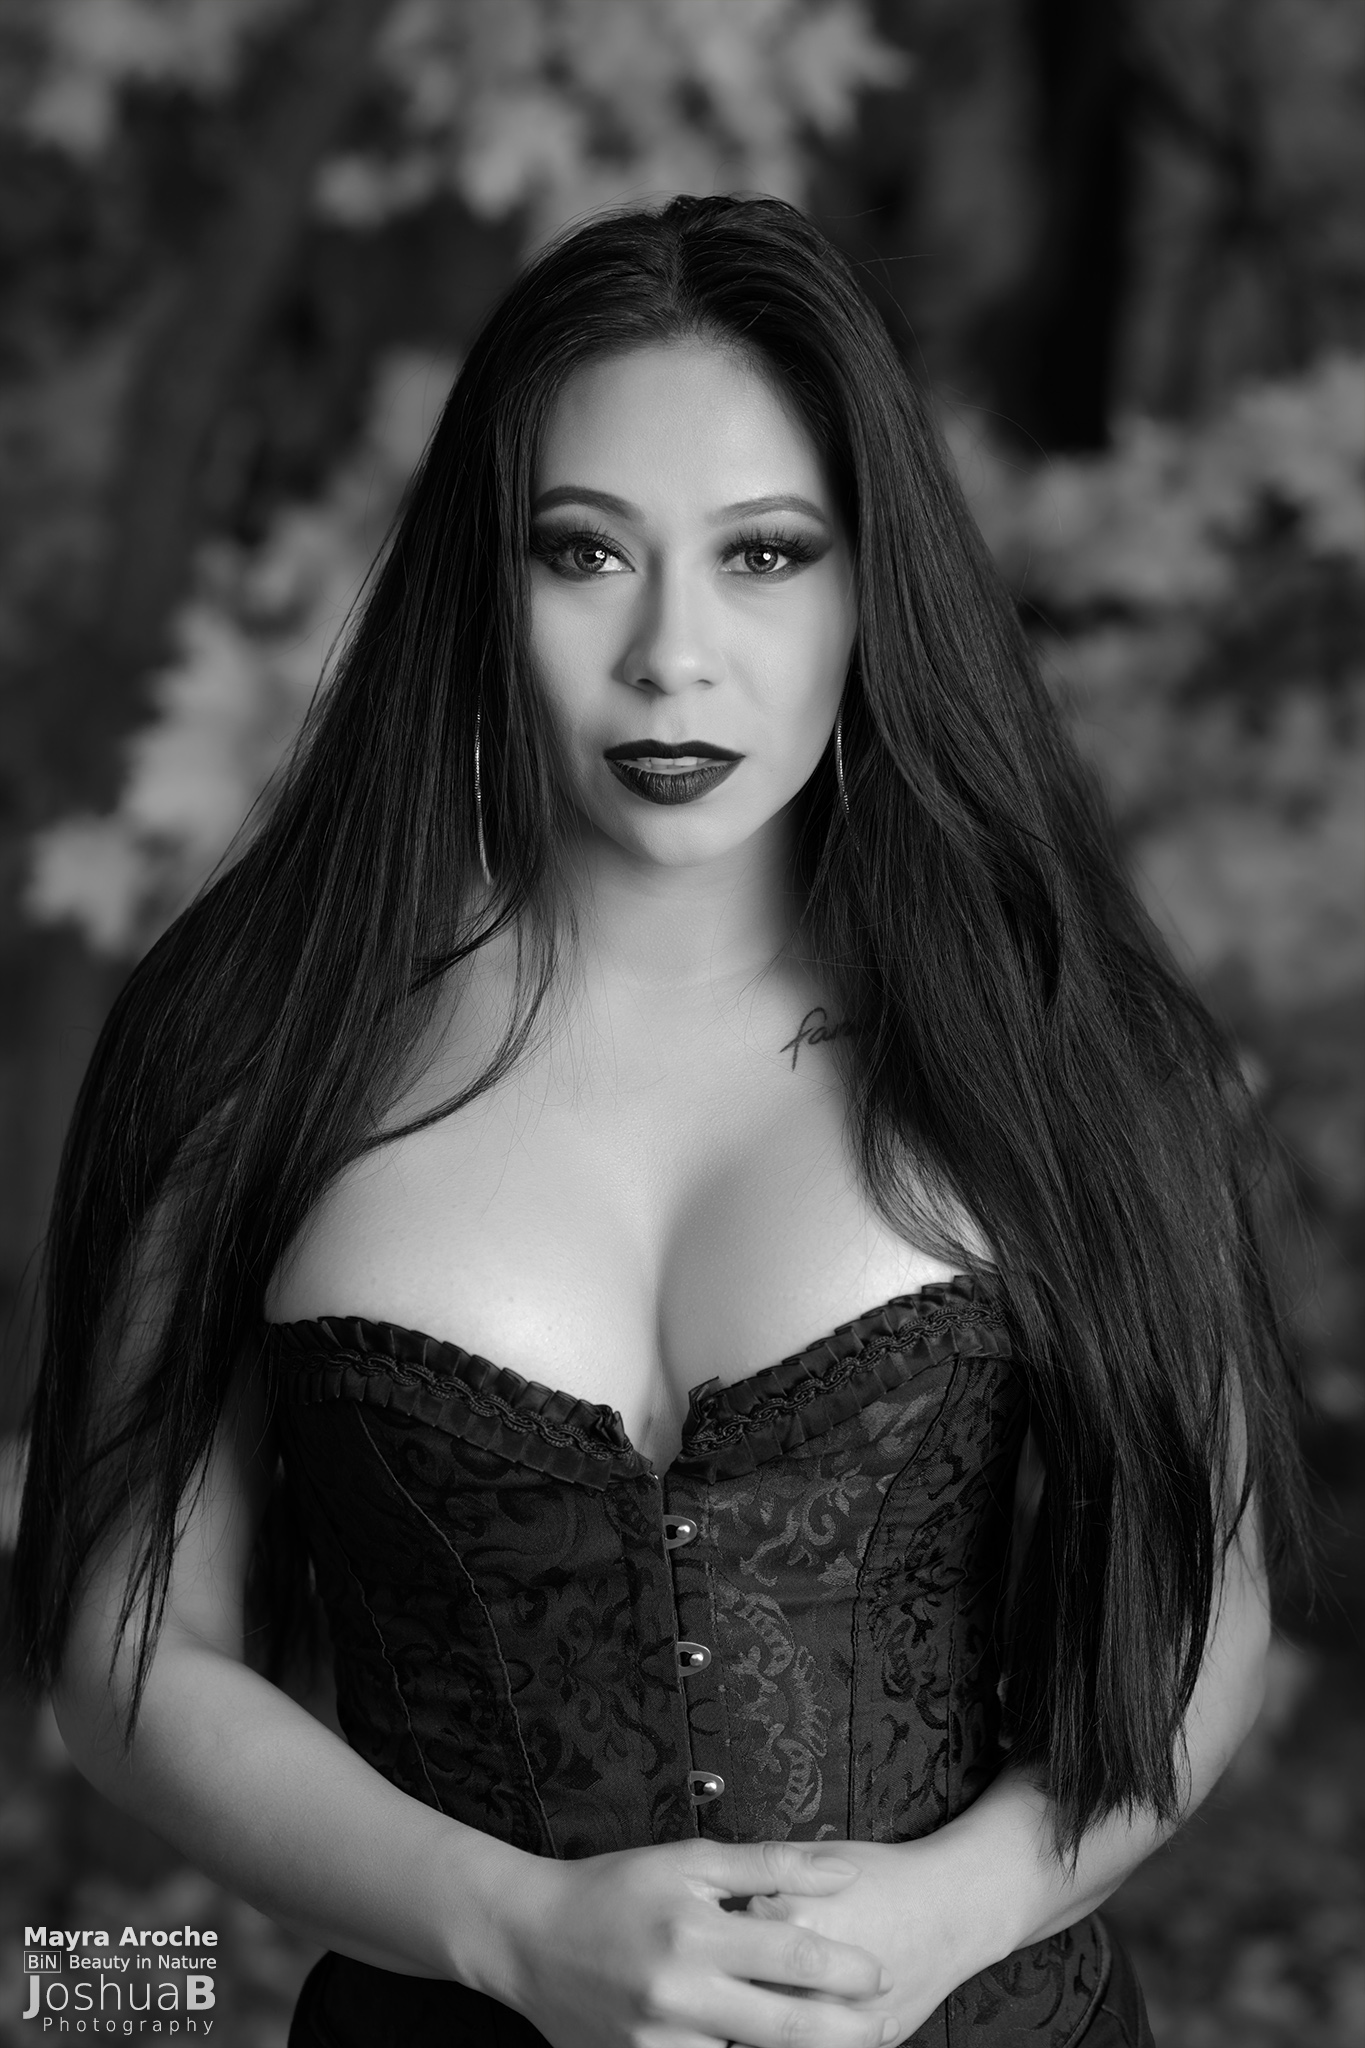 Sexy Latina in Halloween makeup wearing black corset